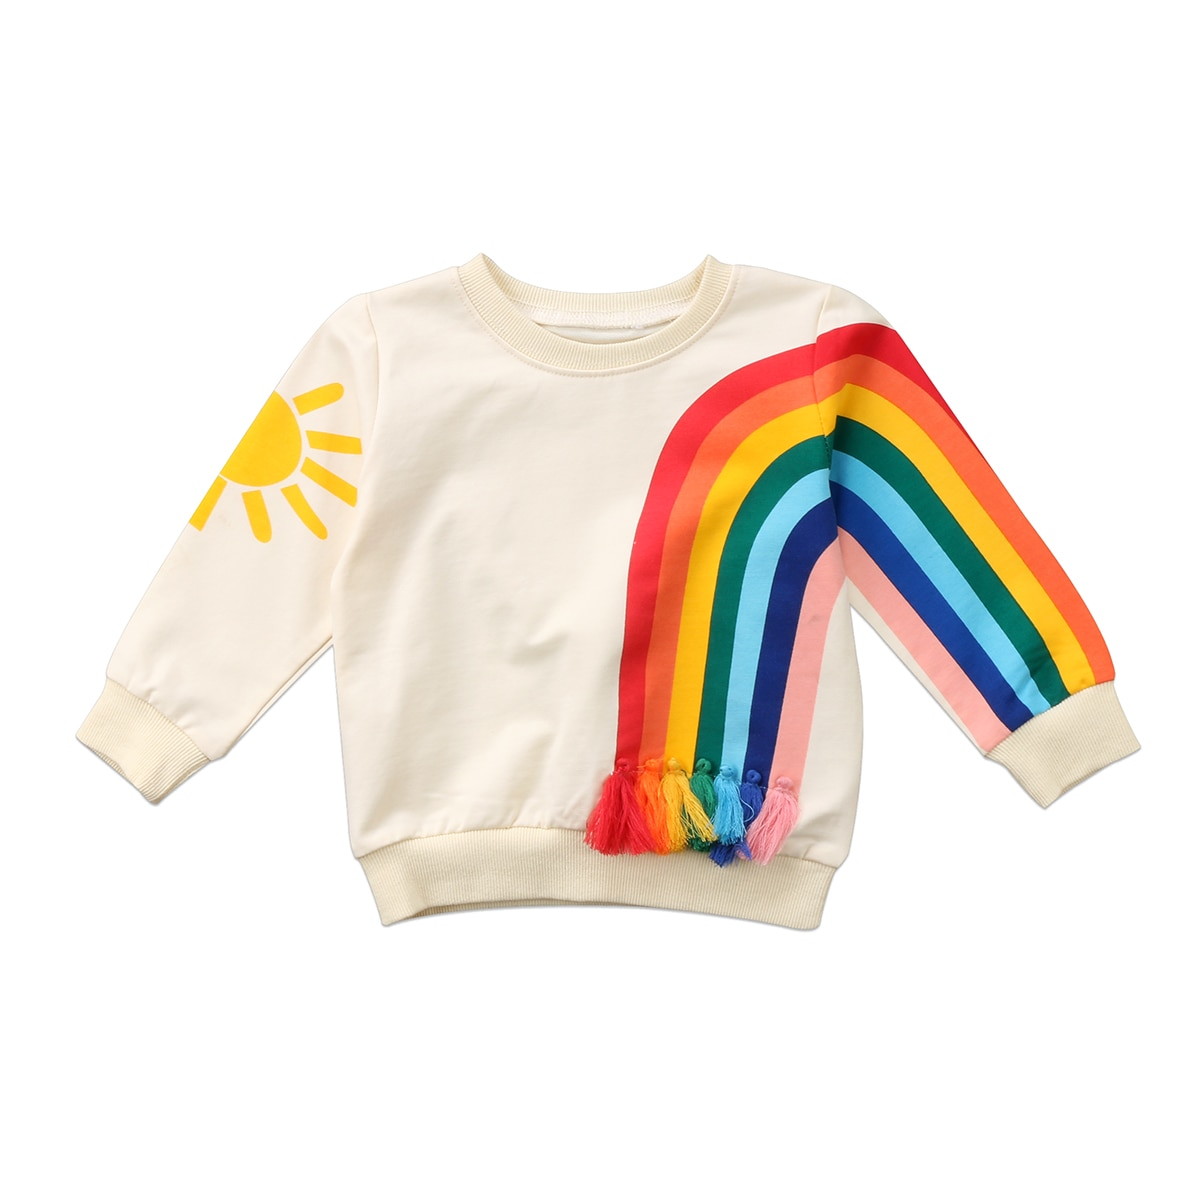 Nuevo Bebé niños niñas Arco Iris camiseta ropa de manga larga o-Cuello camisetas para bebé niño niña